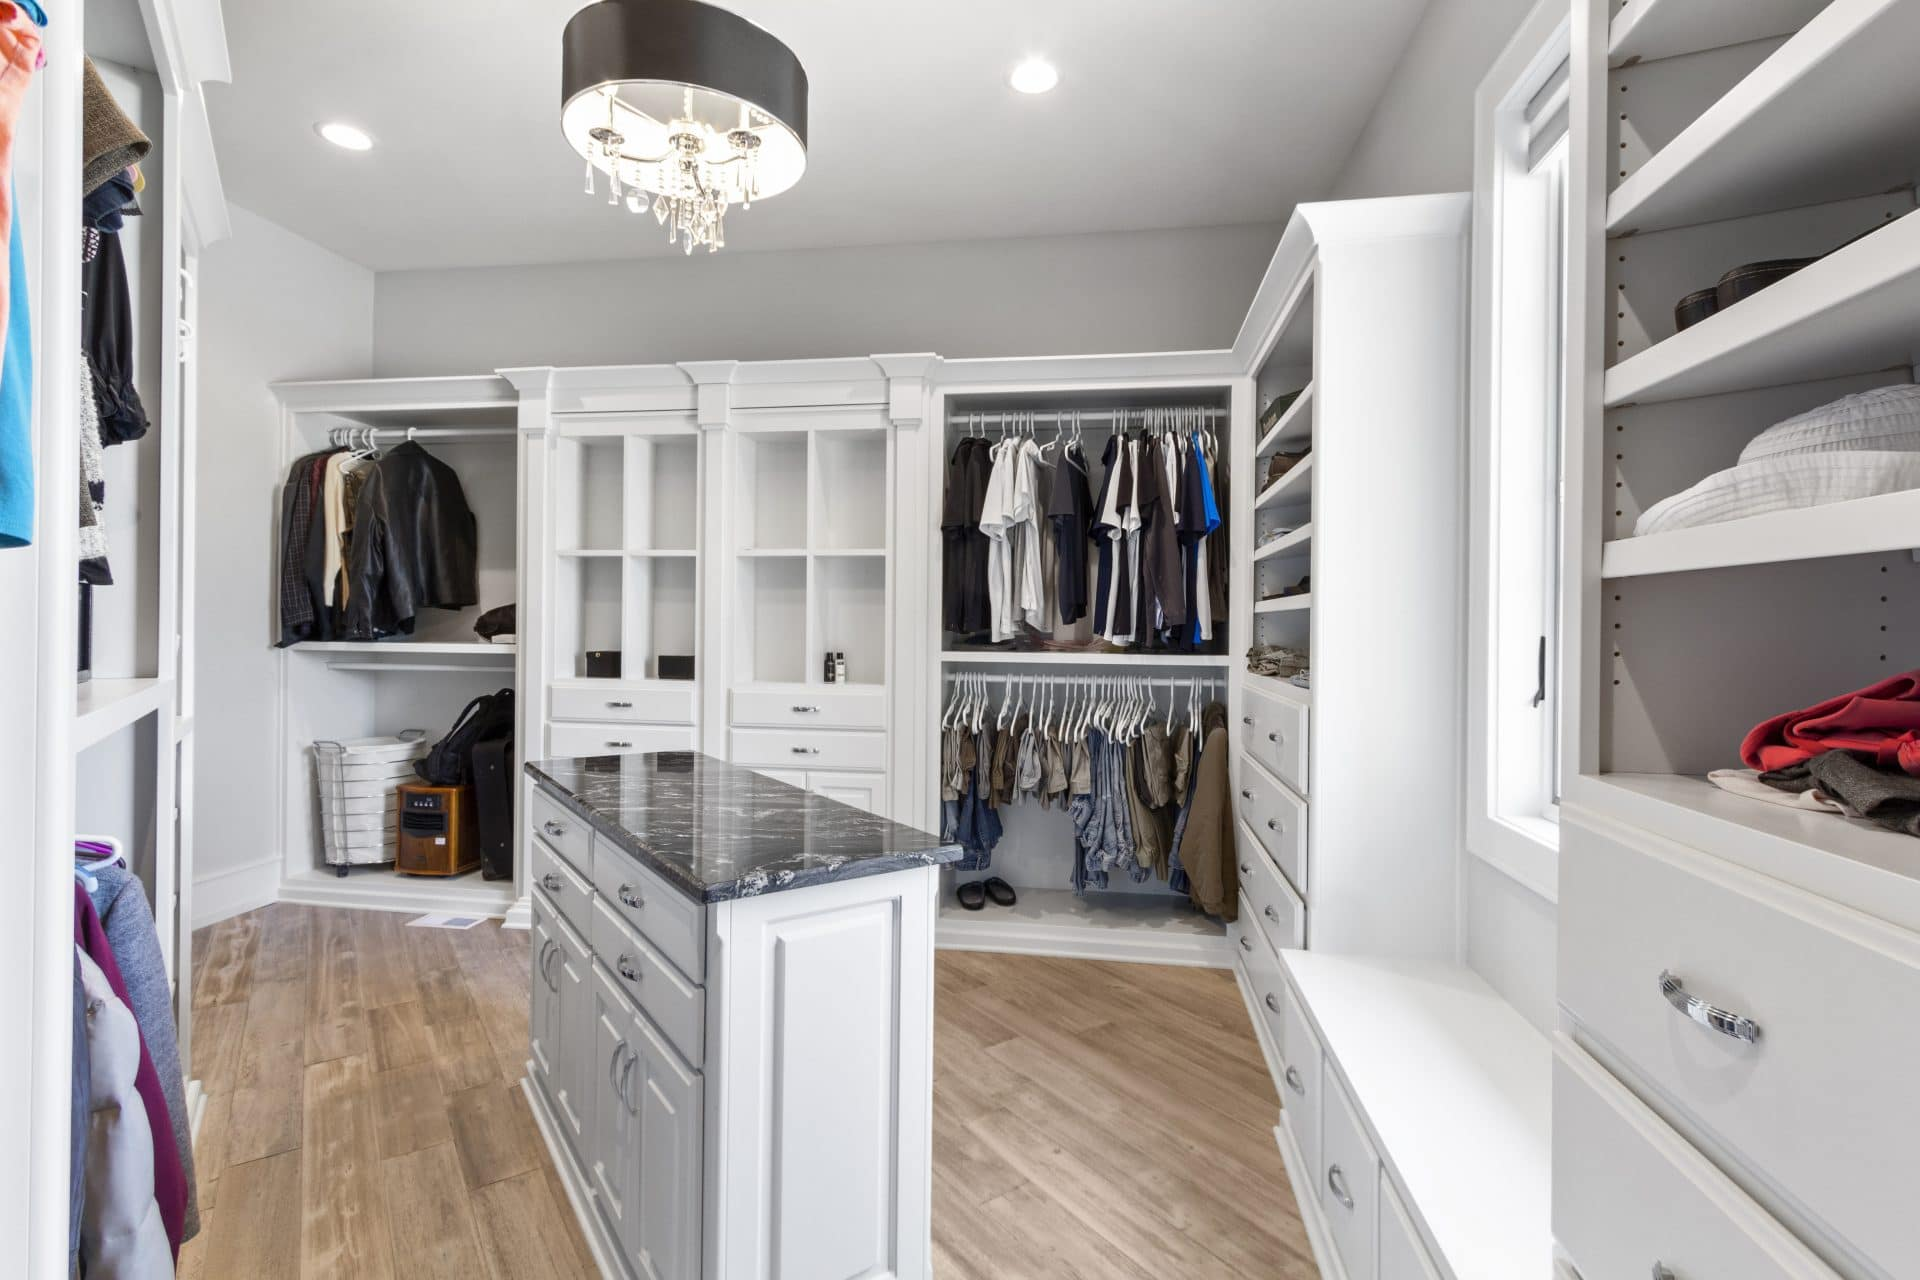 Add stylish door fronts